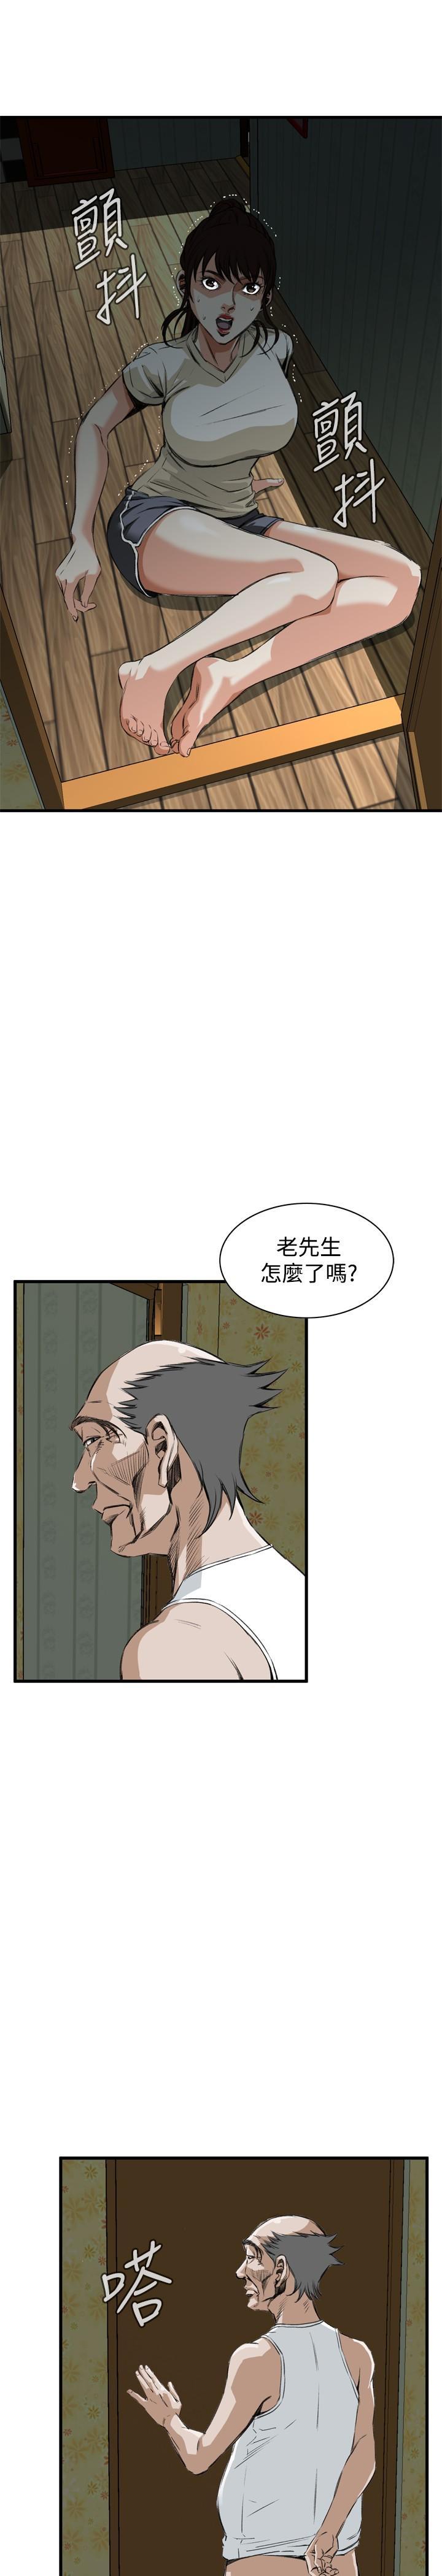 Take a Peek 偷窥 Ch.39~60 [Chinese]中文 179